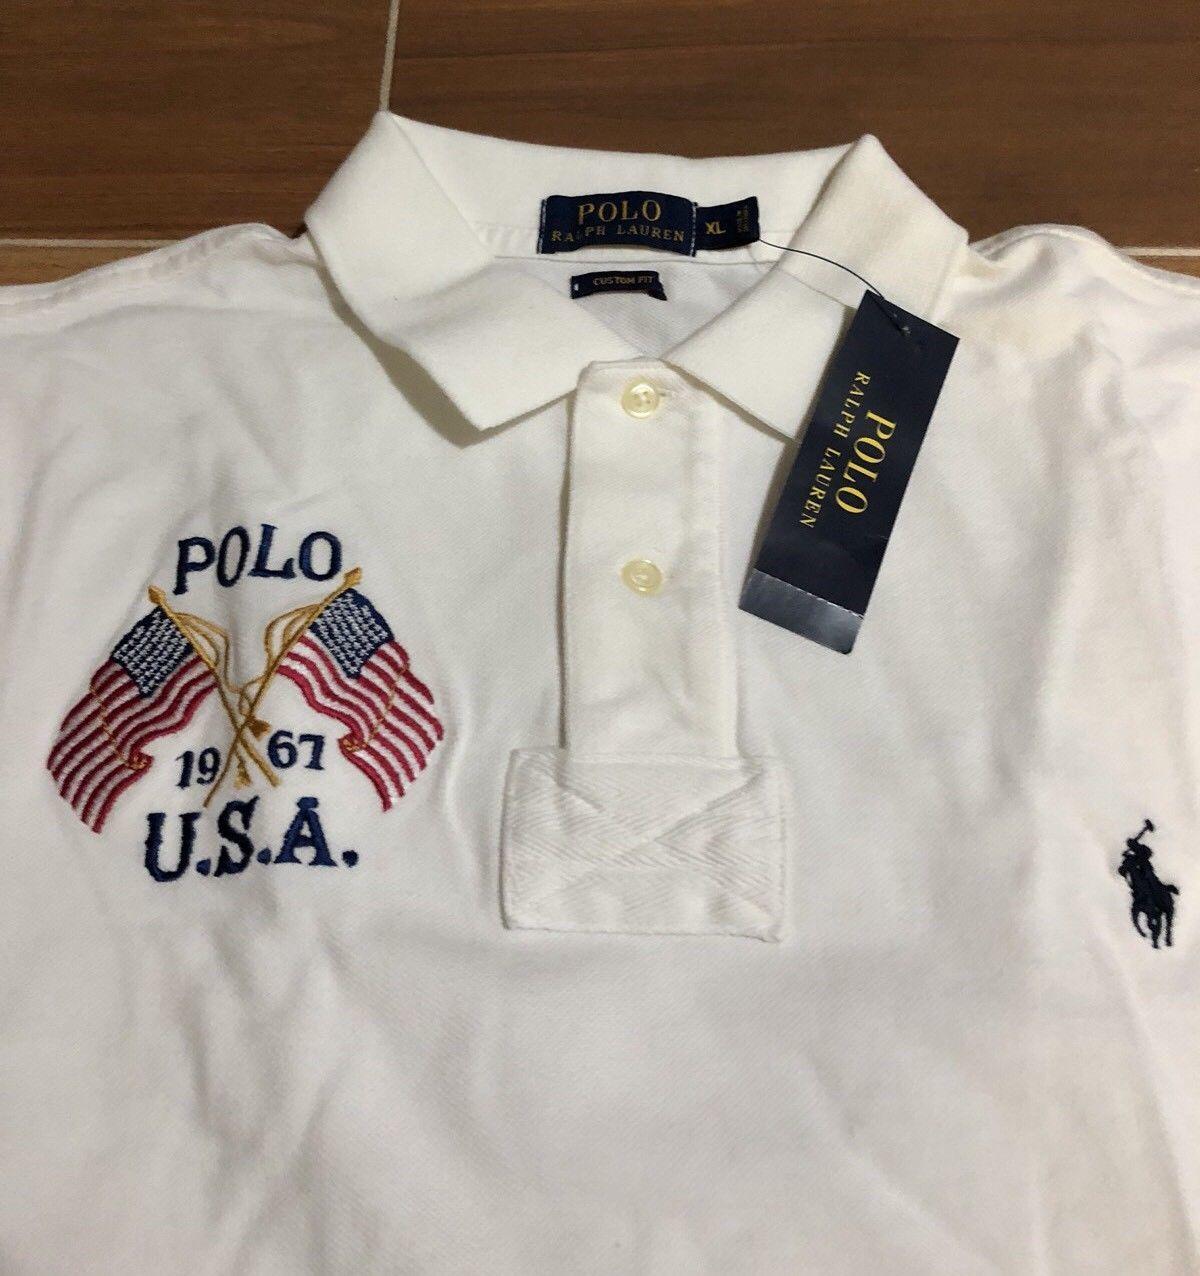 bb5f6028 S l1600. S l1600. Previous. Polo Ralph Lauren men's sz XL Heritage White  Flag Logo Custom Fit ...